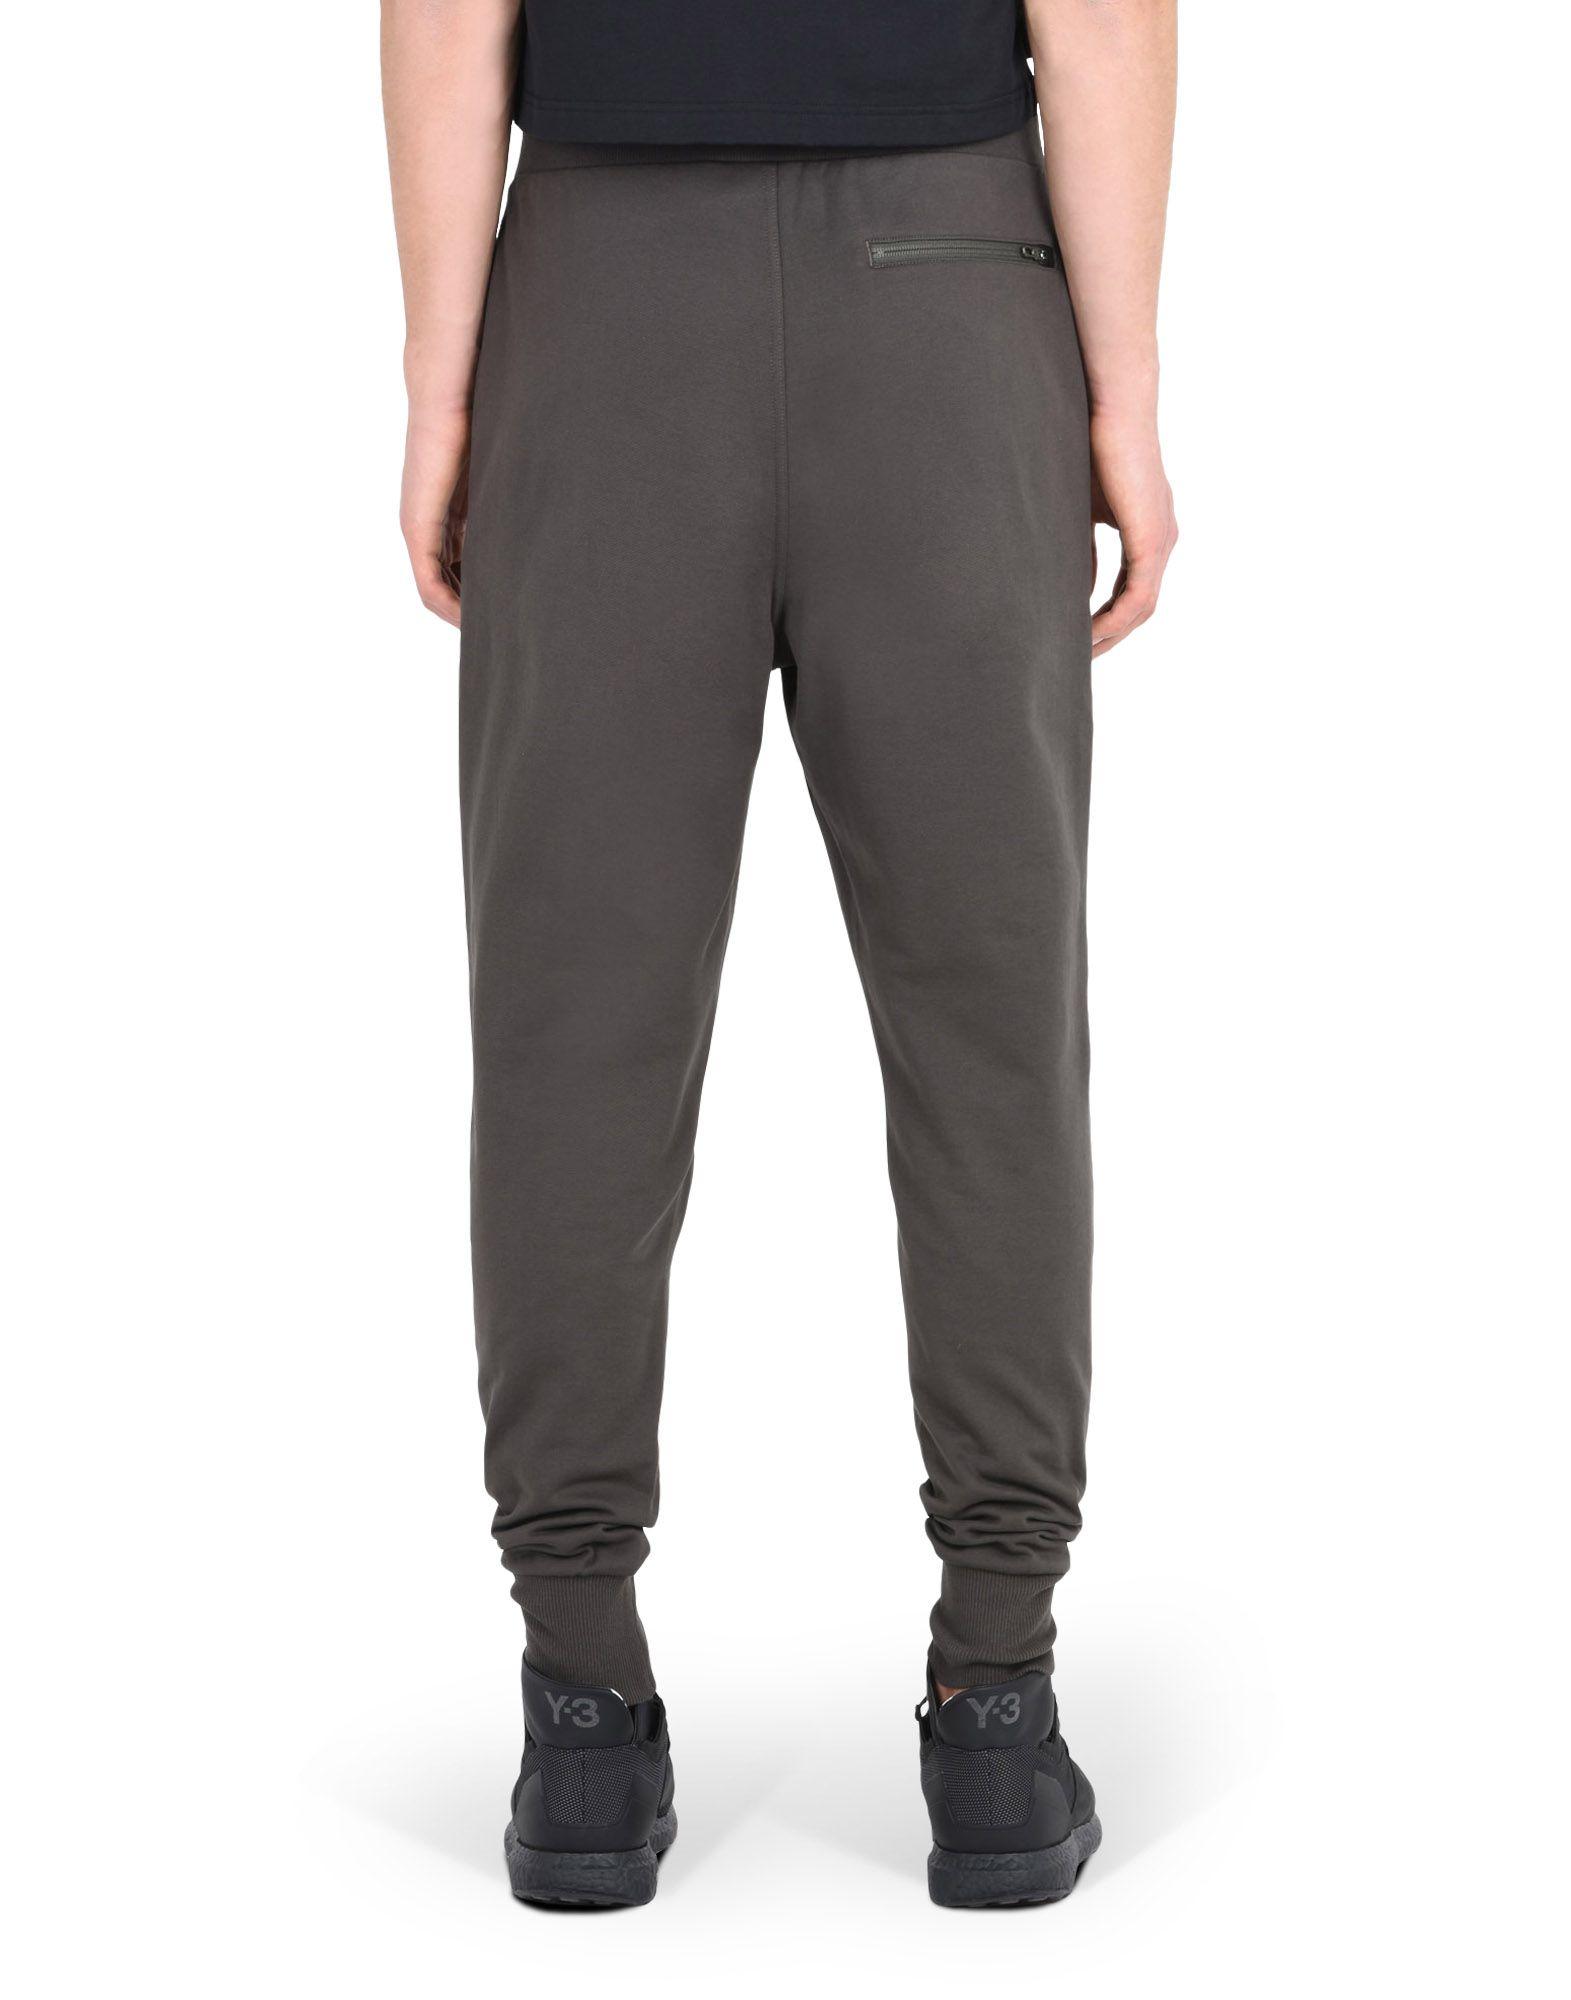 Y-3 Y-3 CLASSIC CUFFED PANT Sweatpants Man e